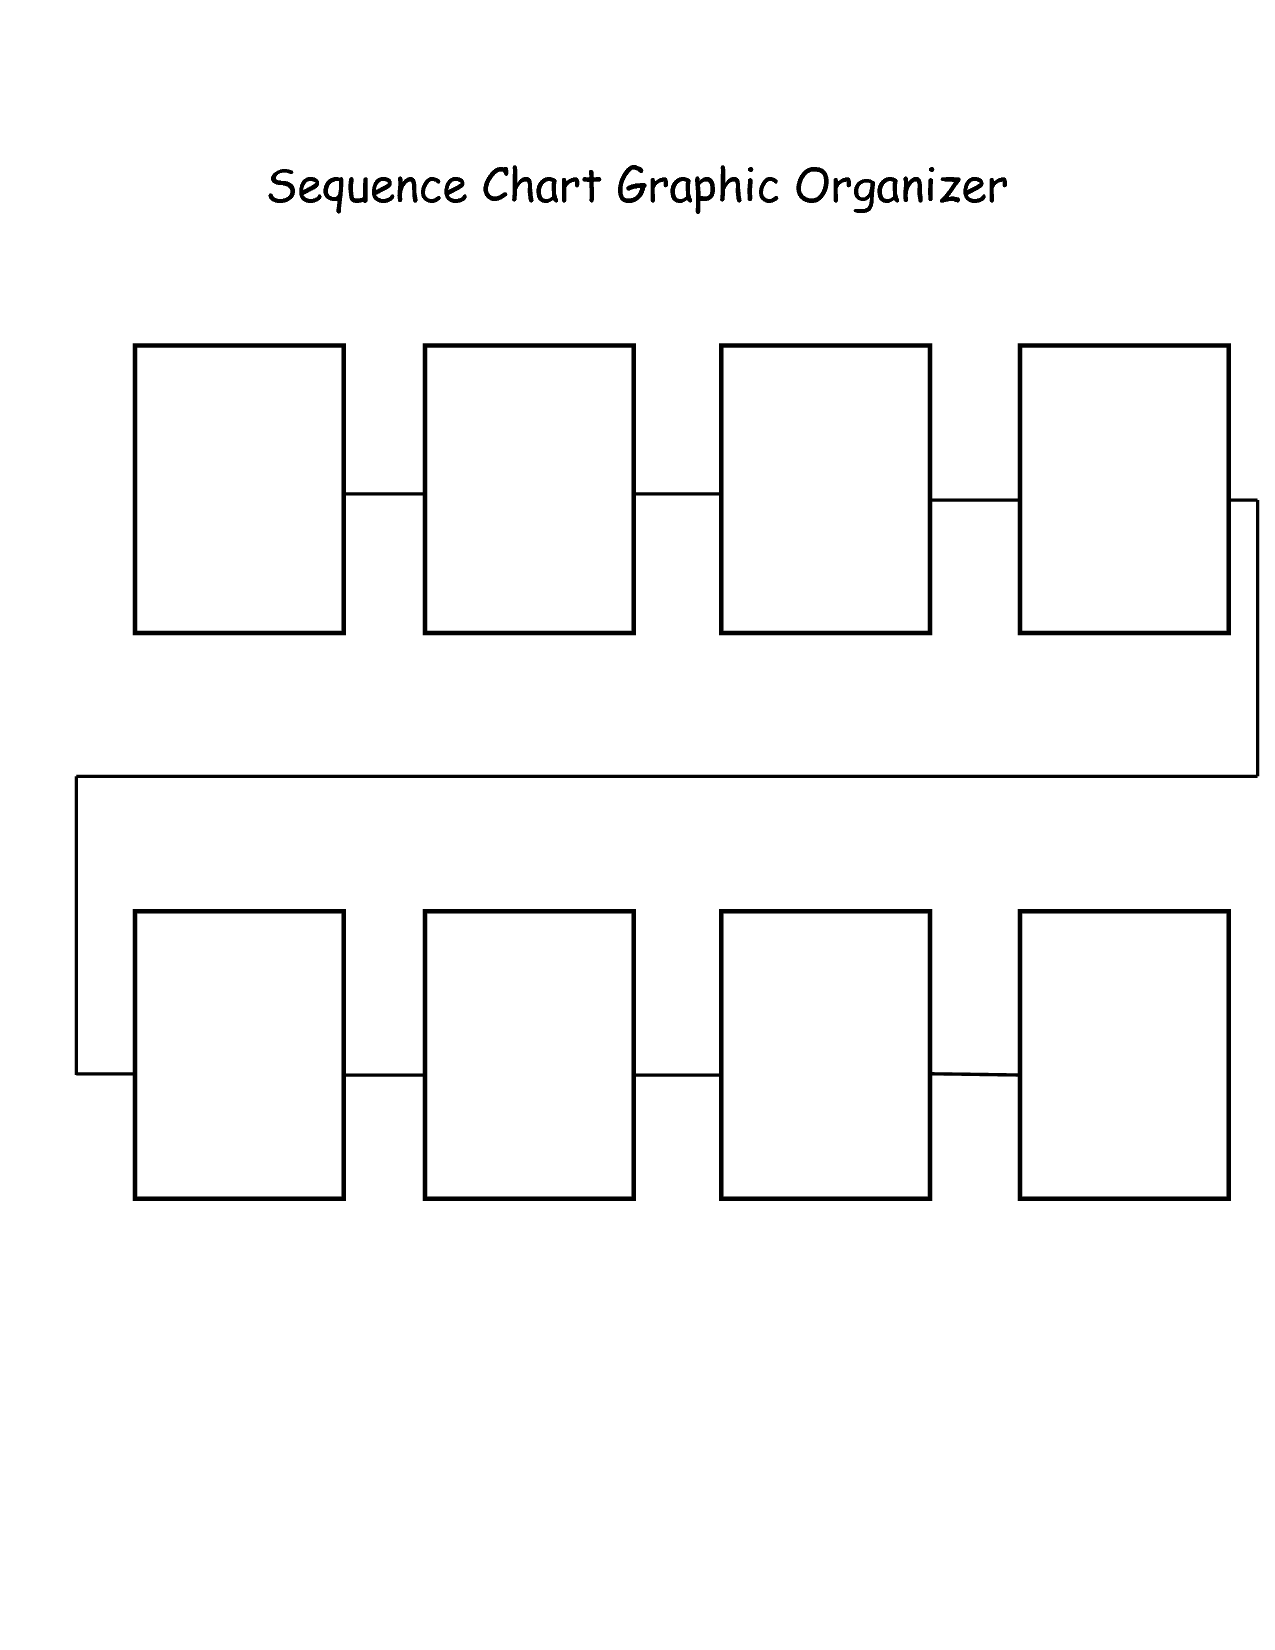 blank tree diagram graphic organizer s plan plus underfloor heating wiring organizers sequence chart